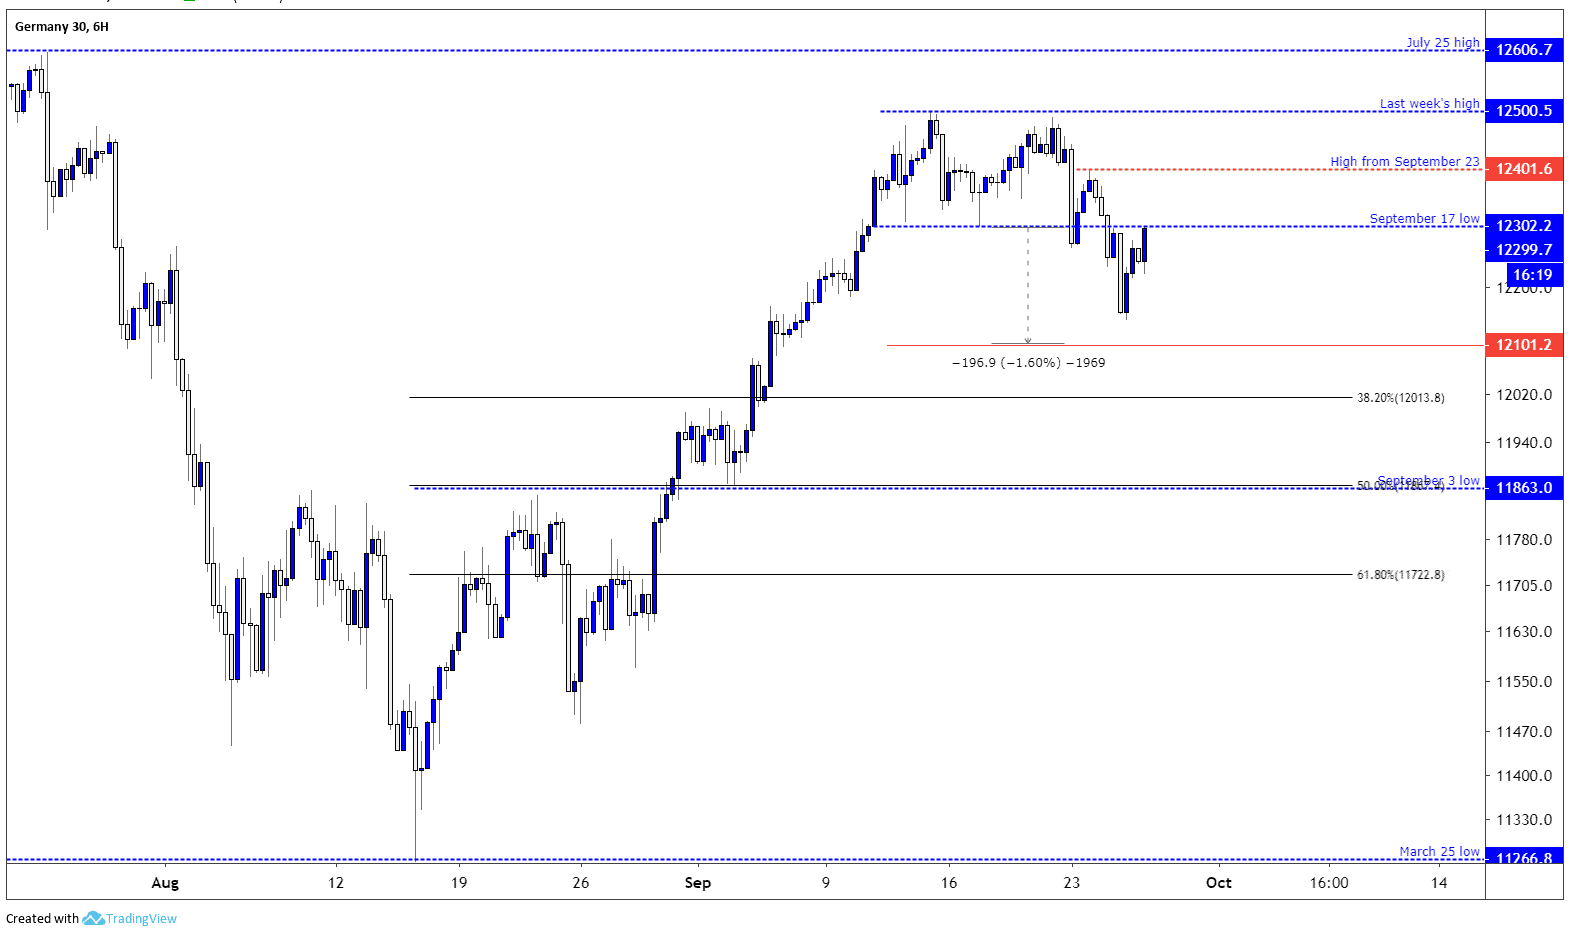 DAX index six-hour chart